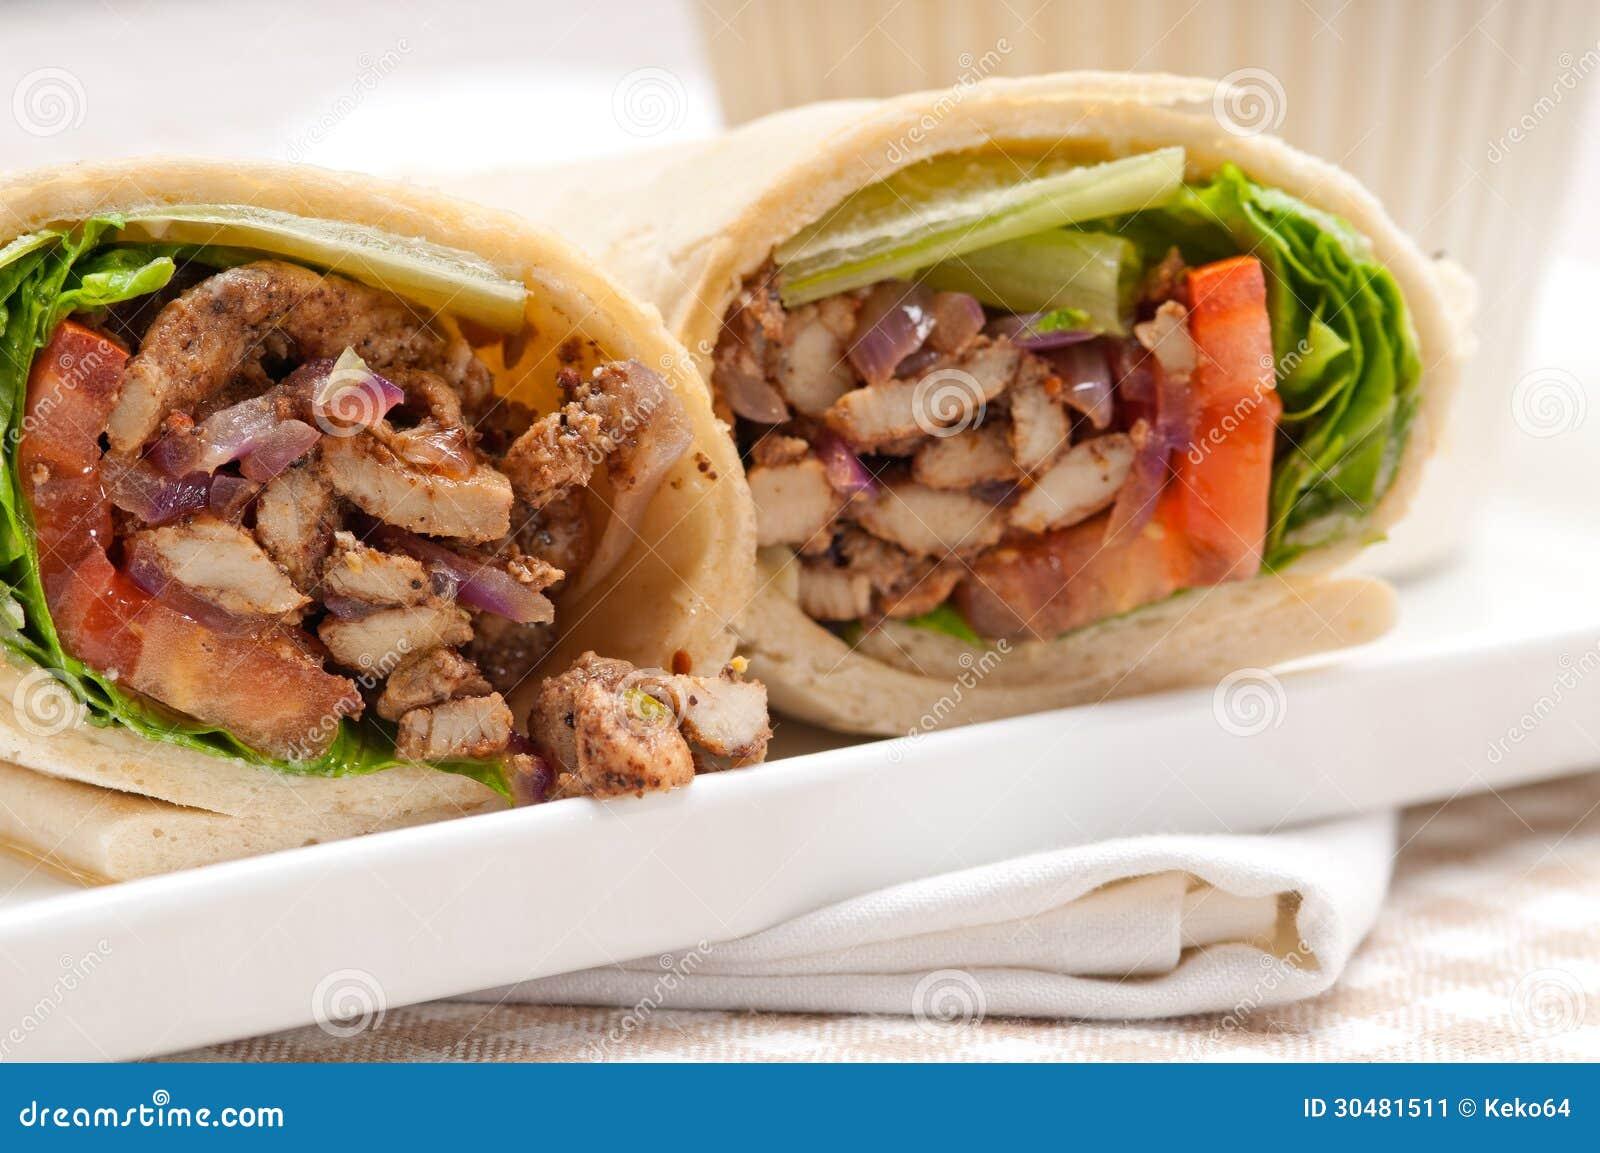 Chicken shawarma roll - photo#14